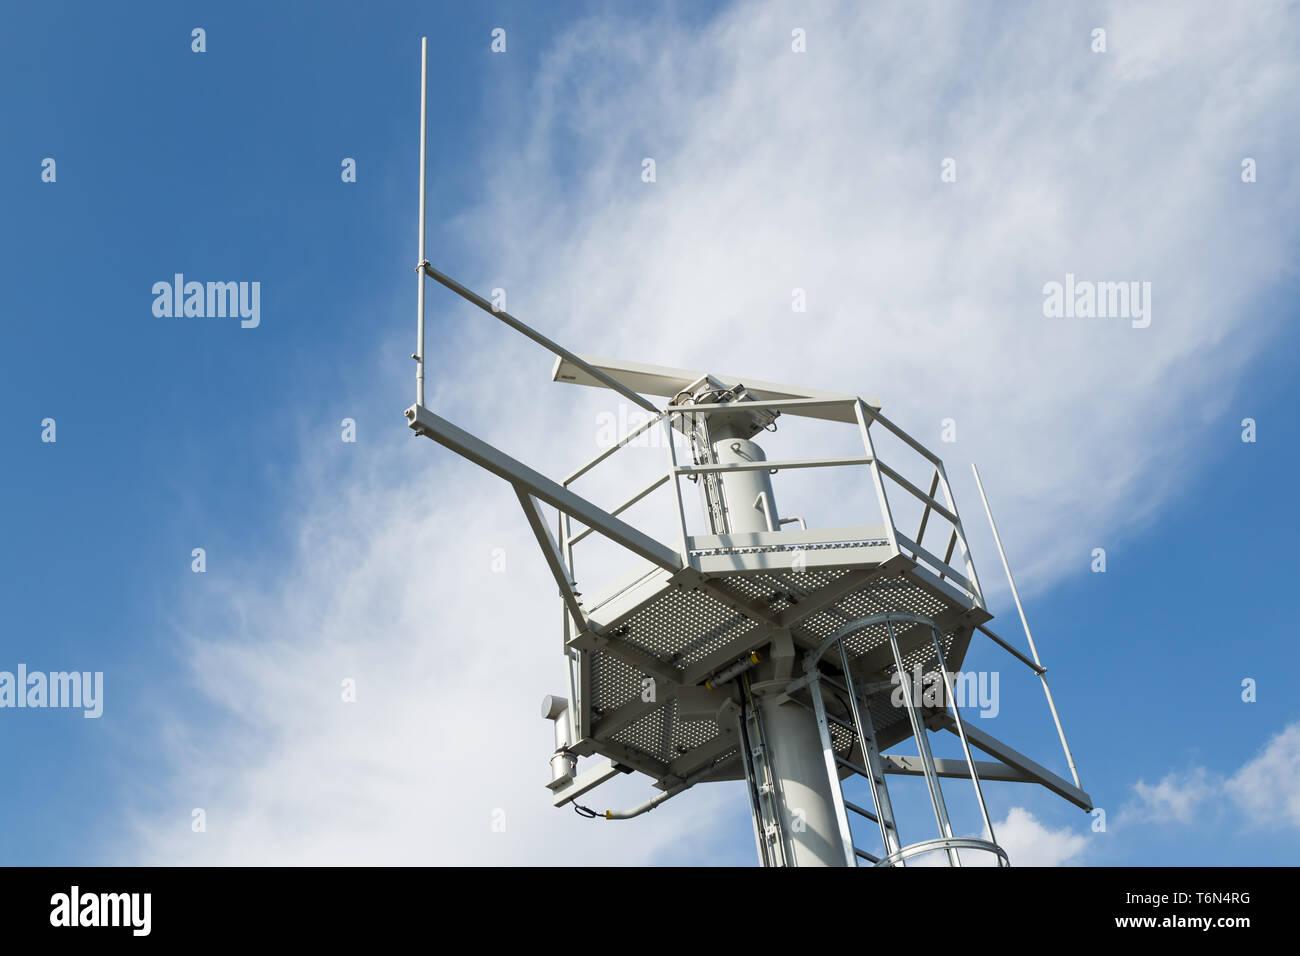 Iron tower with radar and radio communication equipment Stock Photo